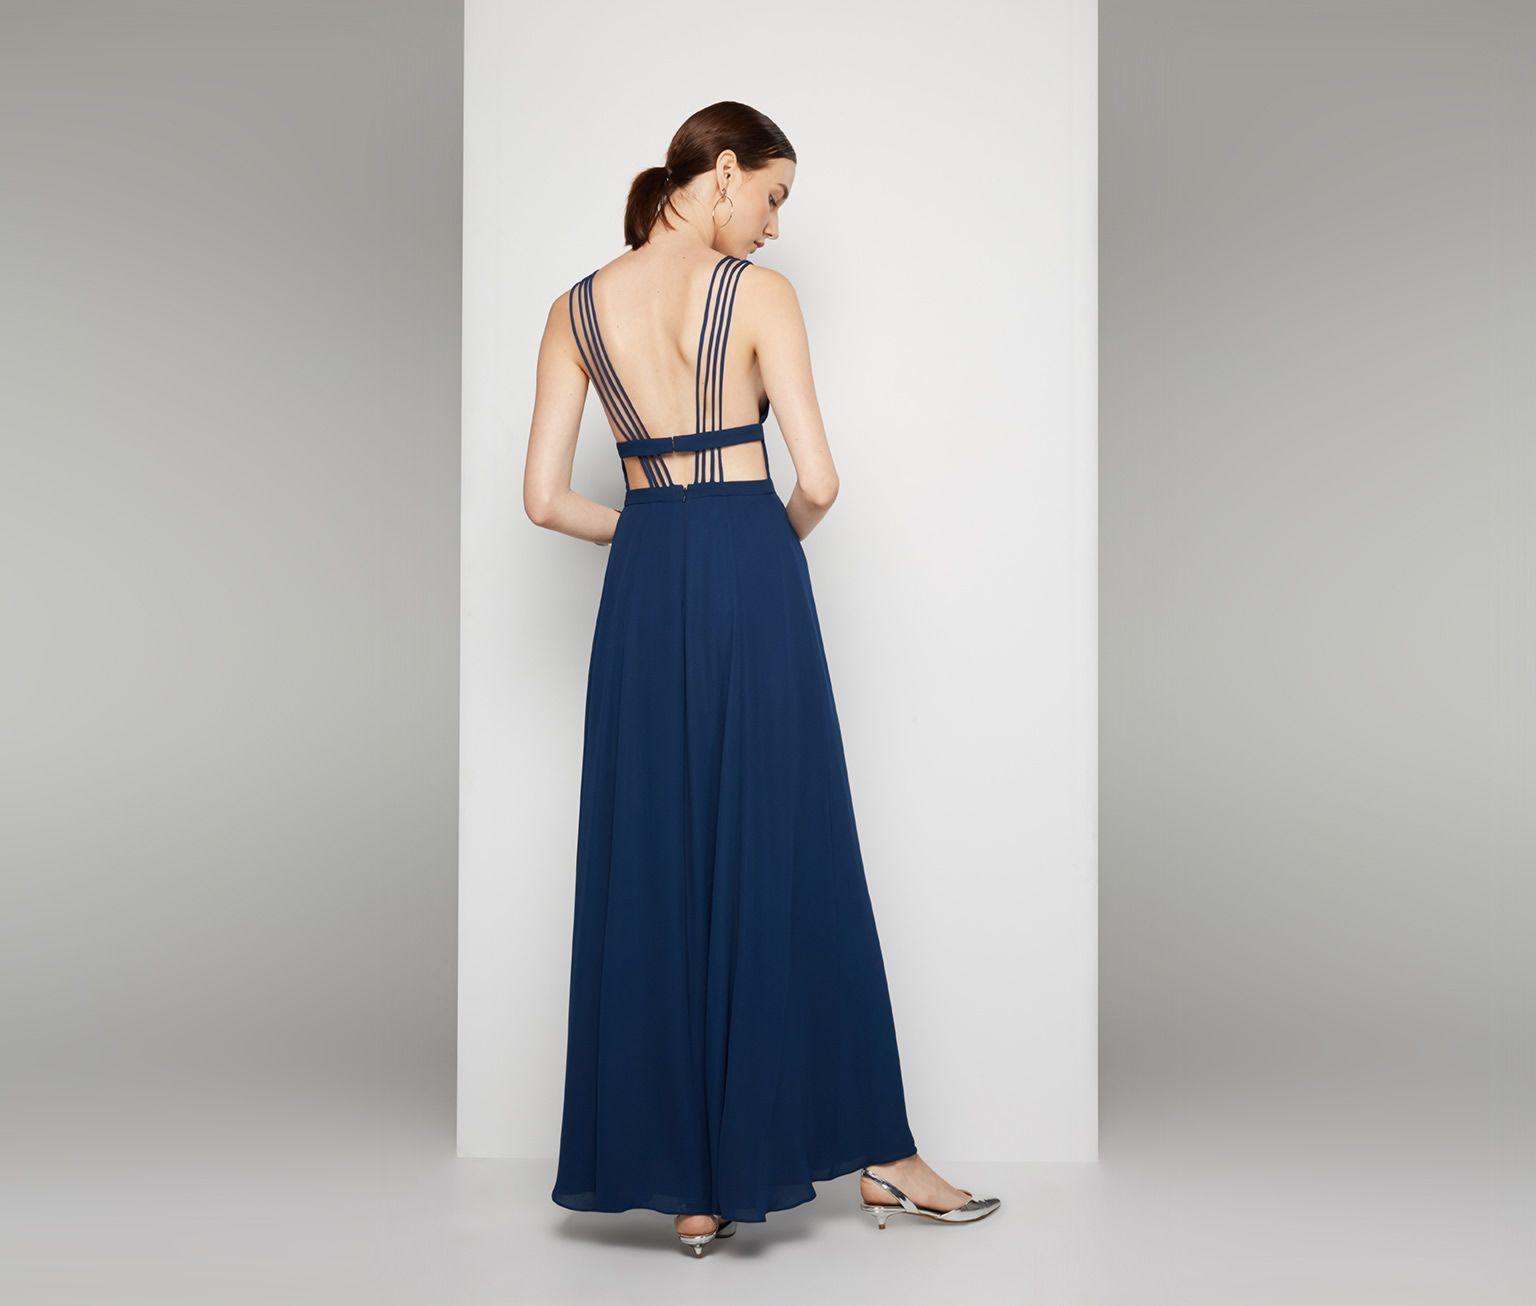 Bella vita in dresseshairbouquets pinterest dresses